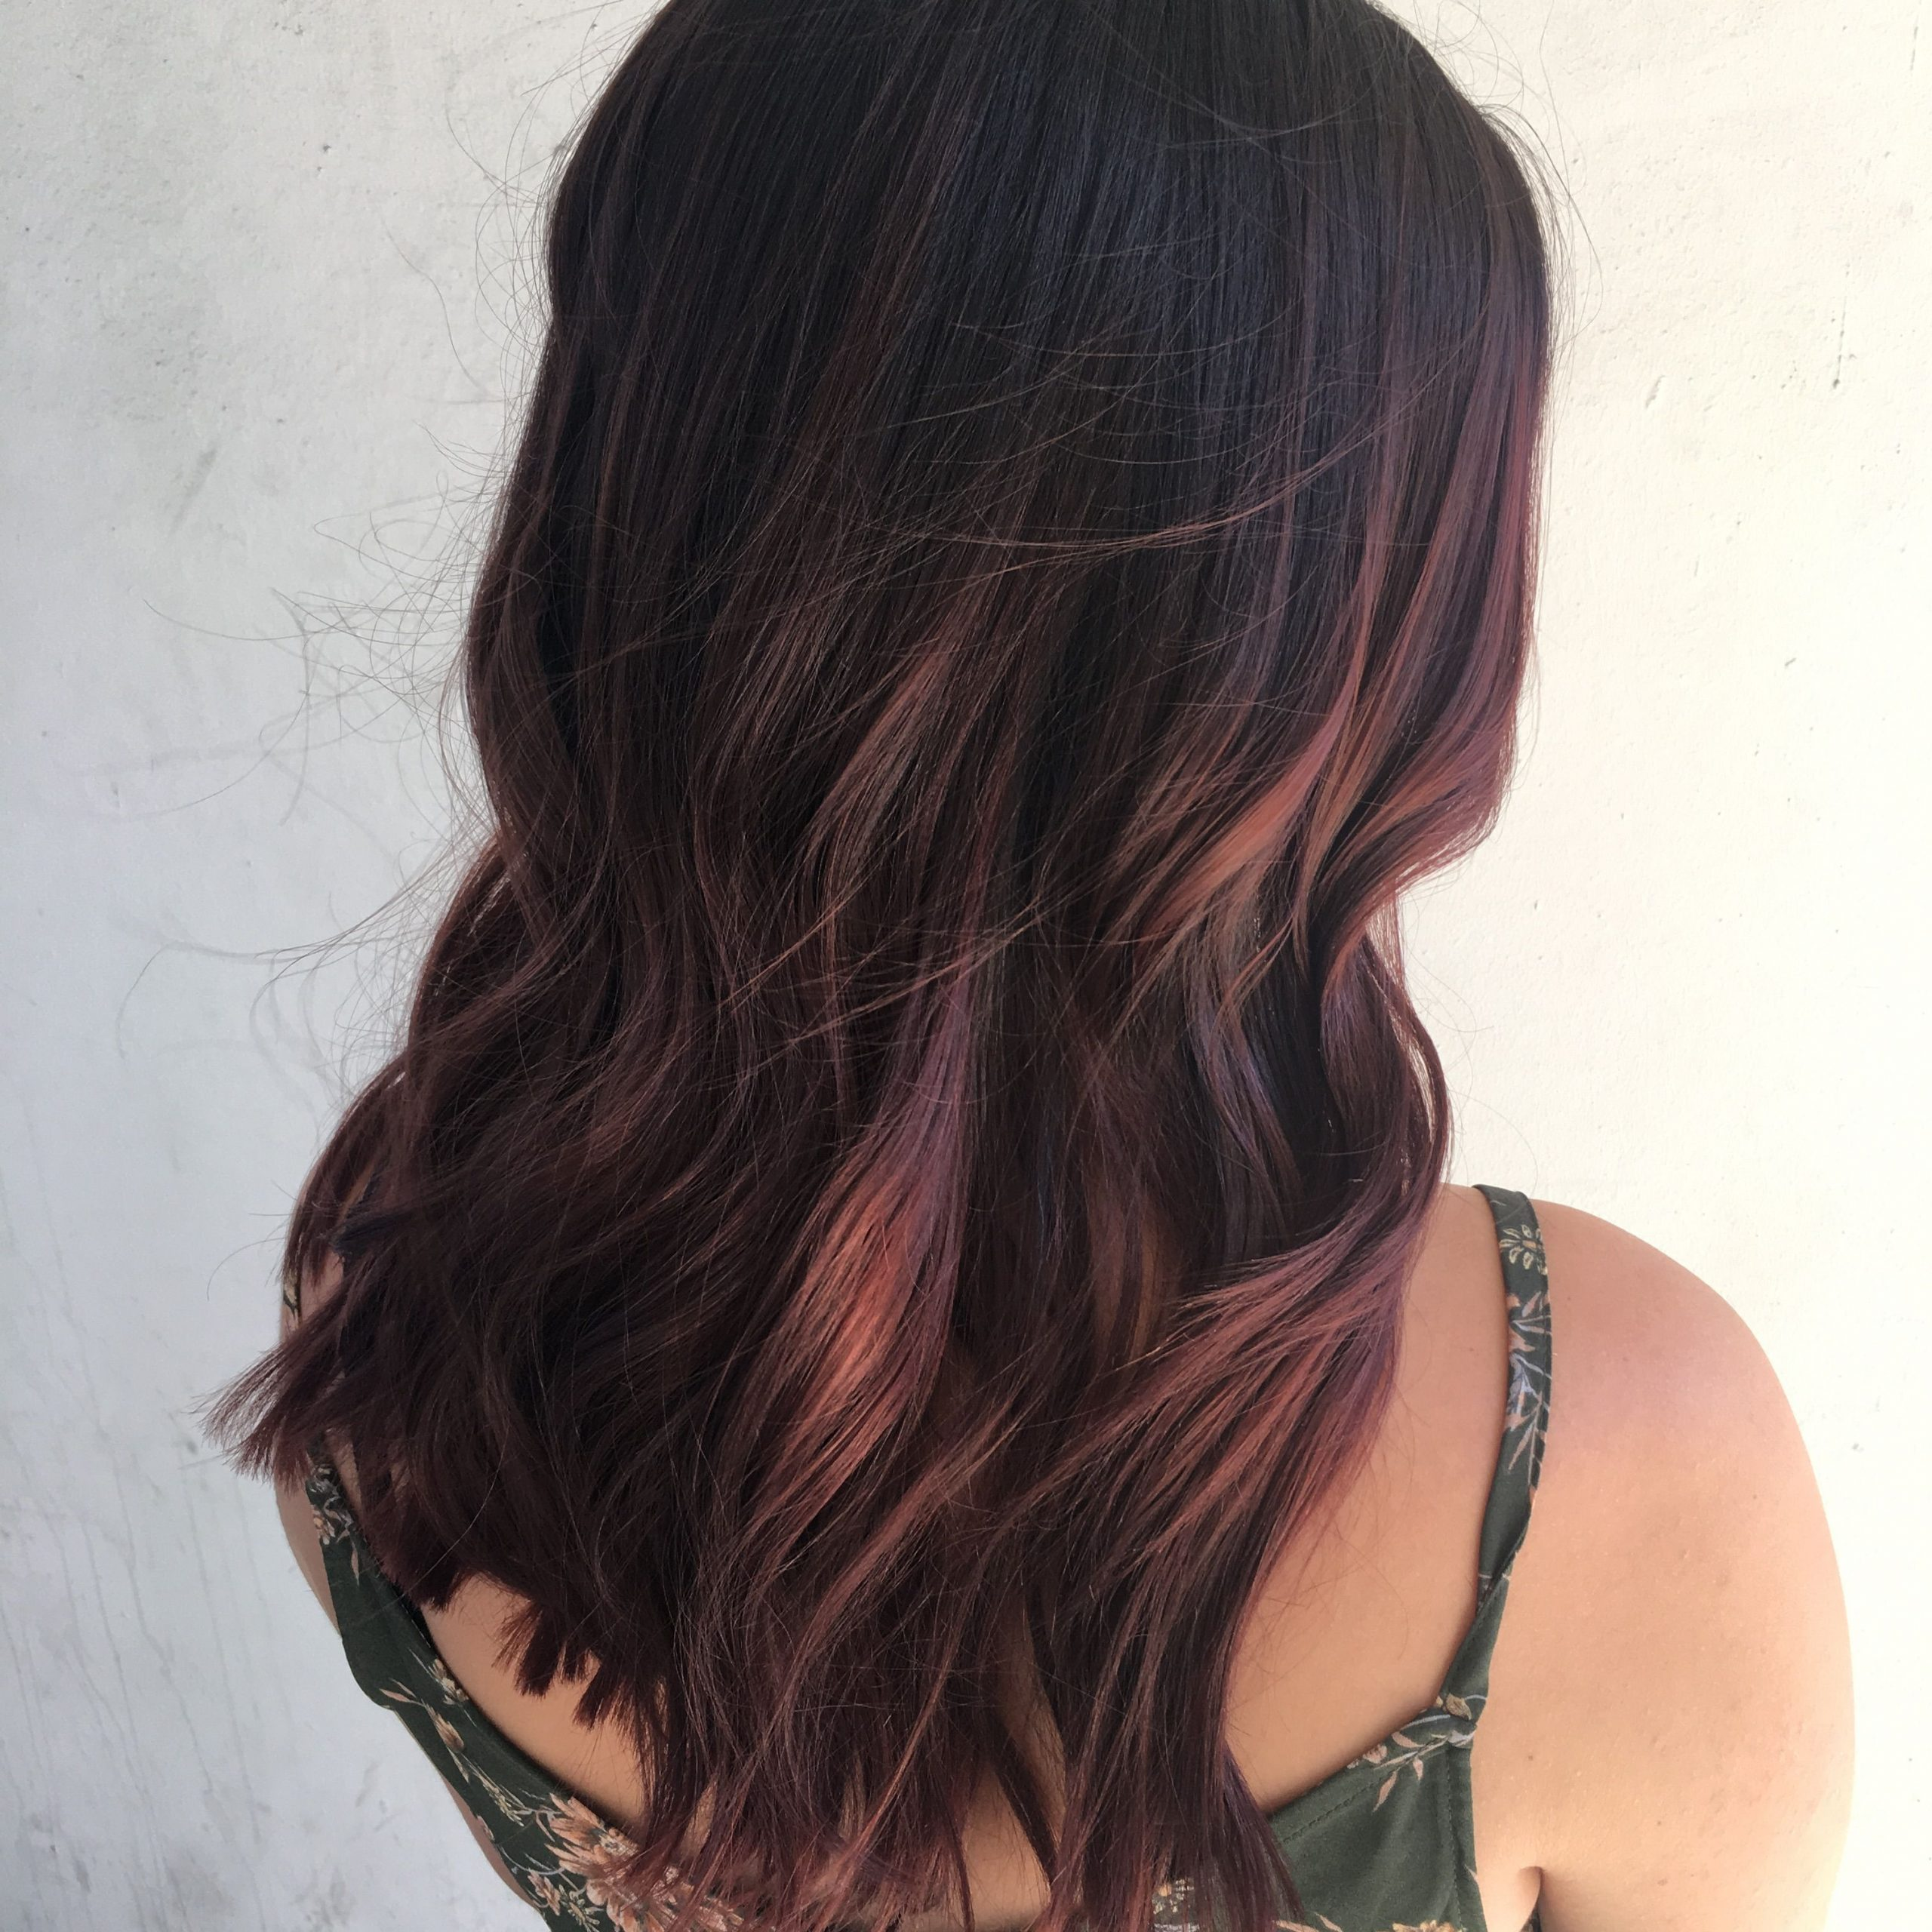 Burgundy Hair, Mahogany Hair, Red Balayage Hair, Hair With Regard To Burgundy Balayage On Dark Hairstyles (View 4 of 20)